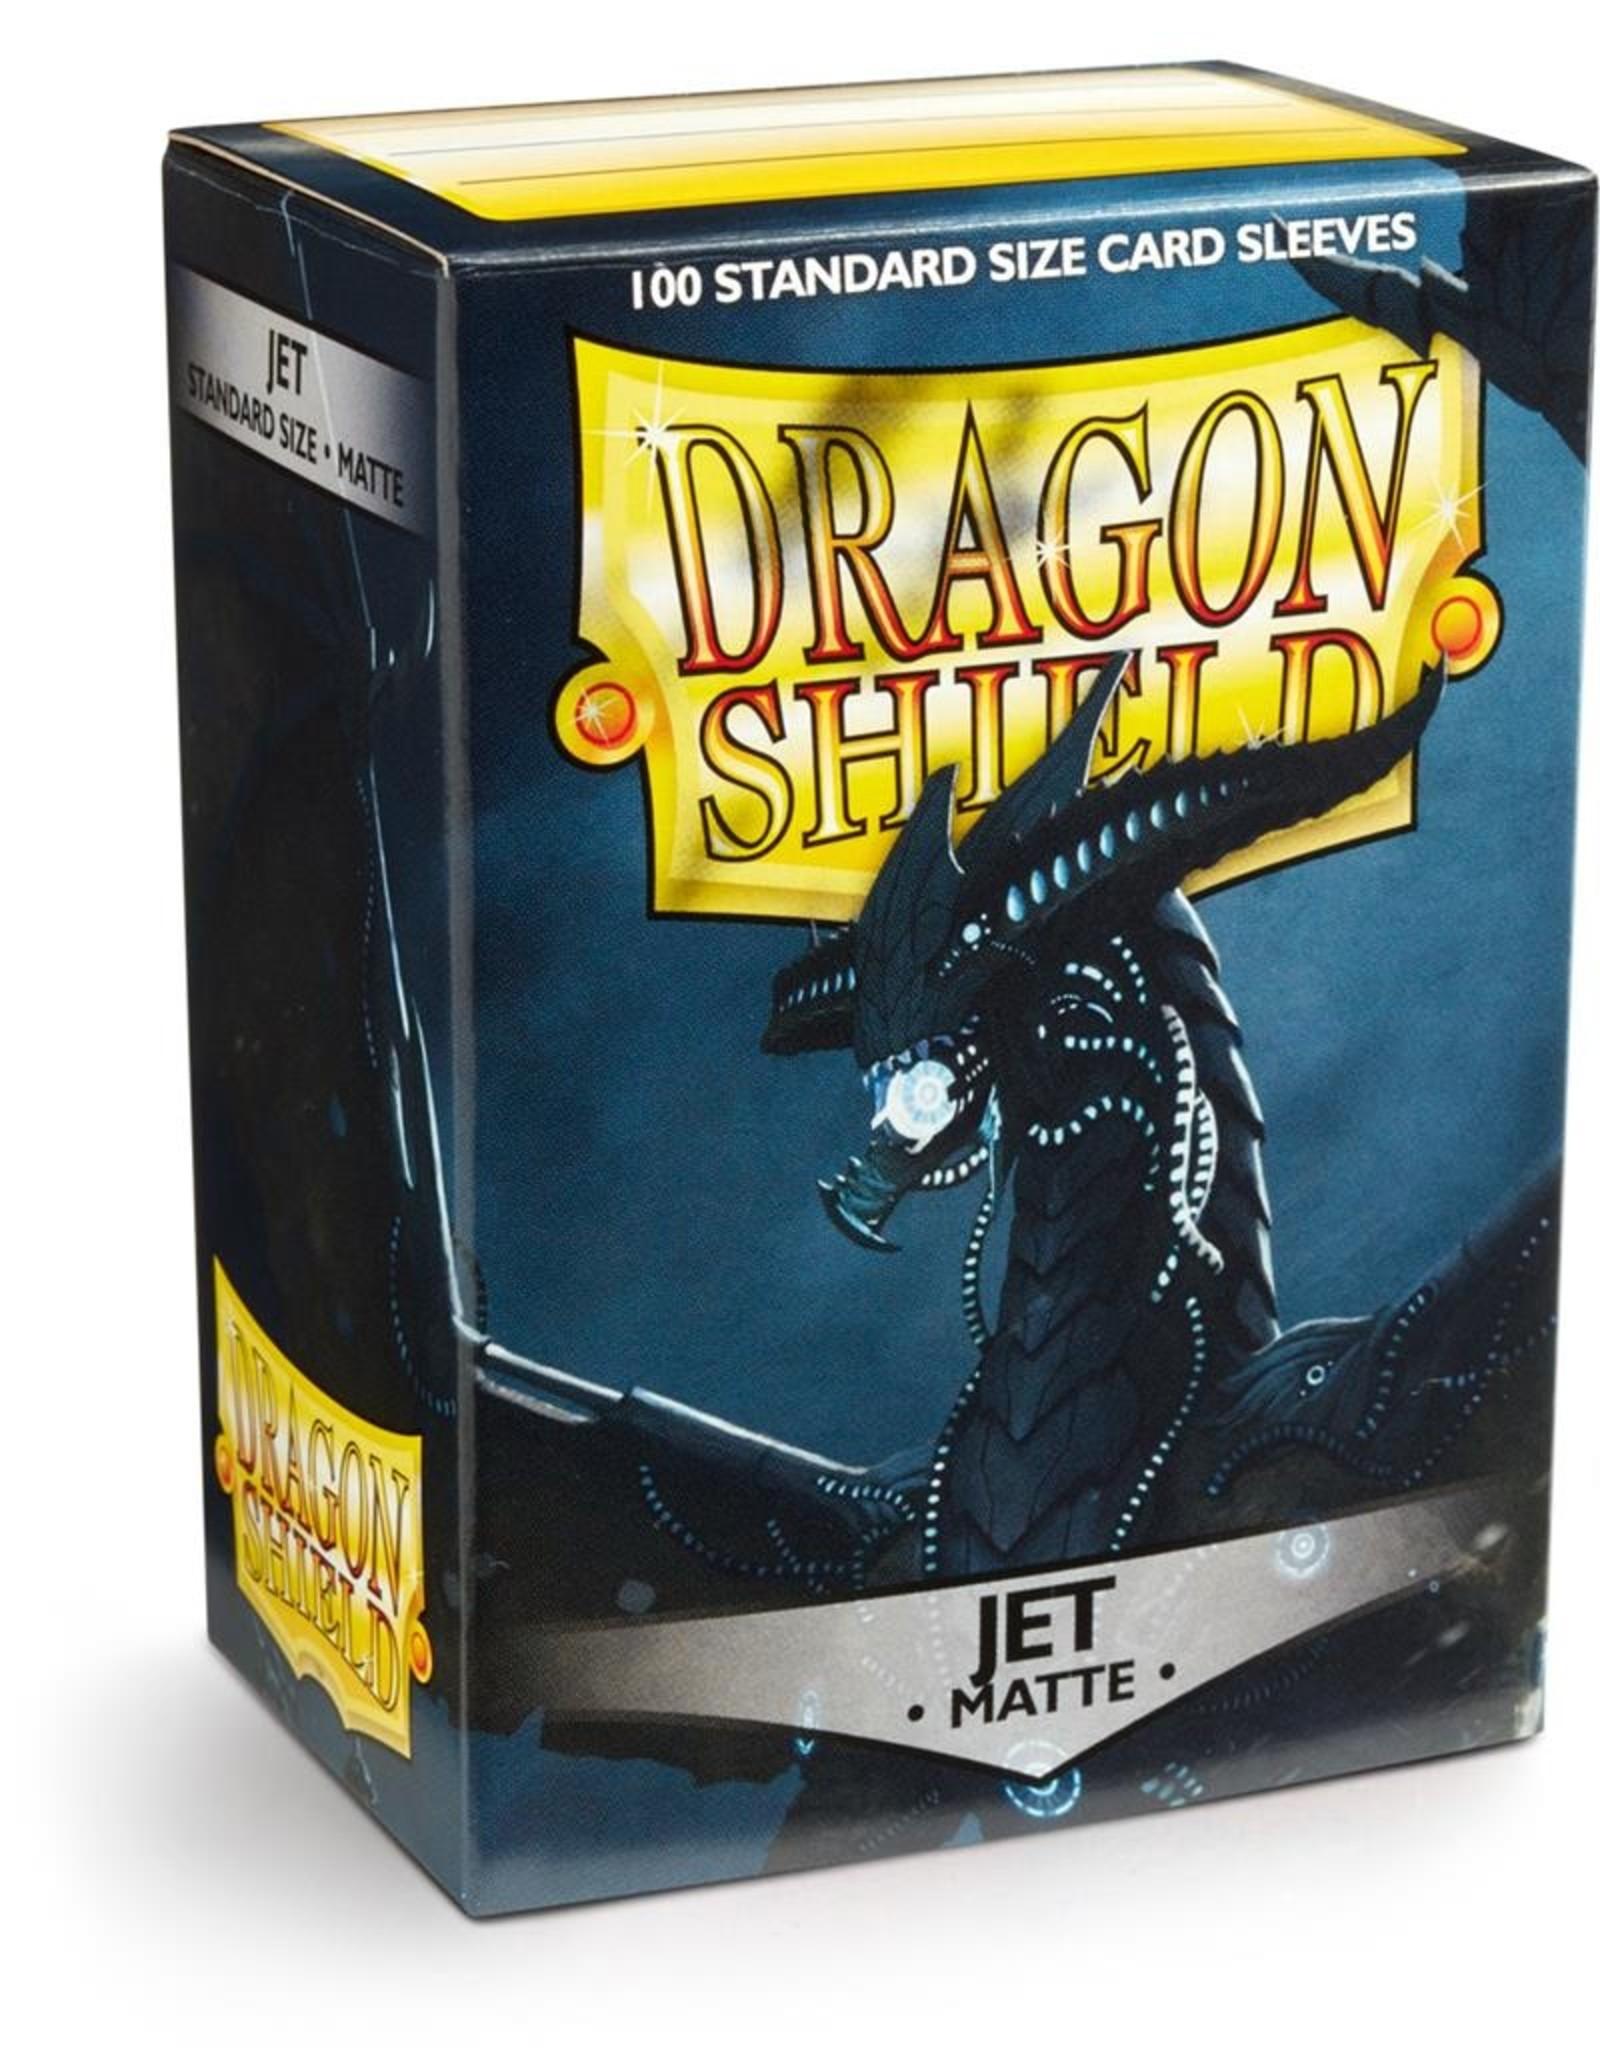 Dragonshield Dragonshield 100 Box Sleeves Matte Jet